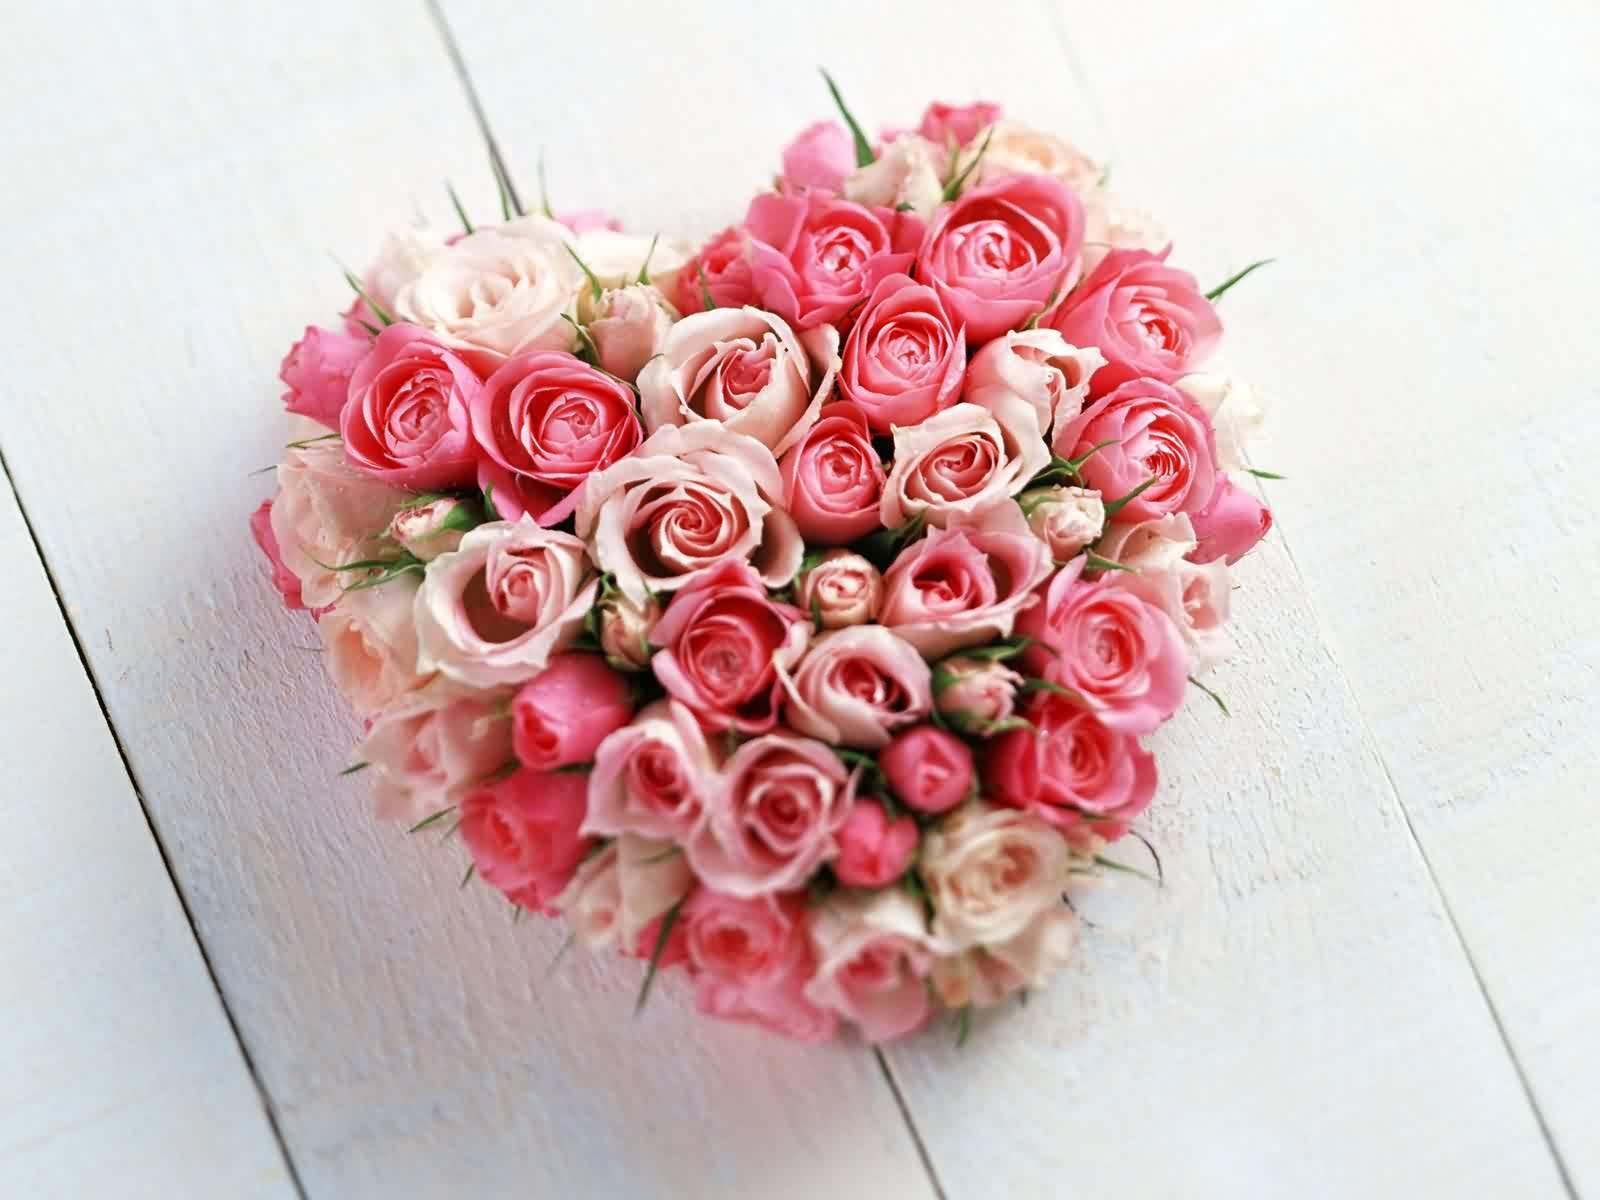 5 Romantic Valentine's Day Ideas